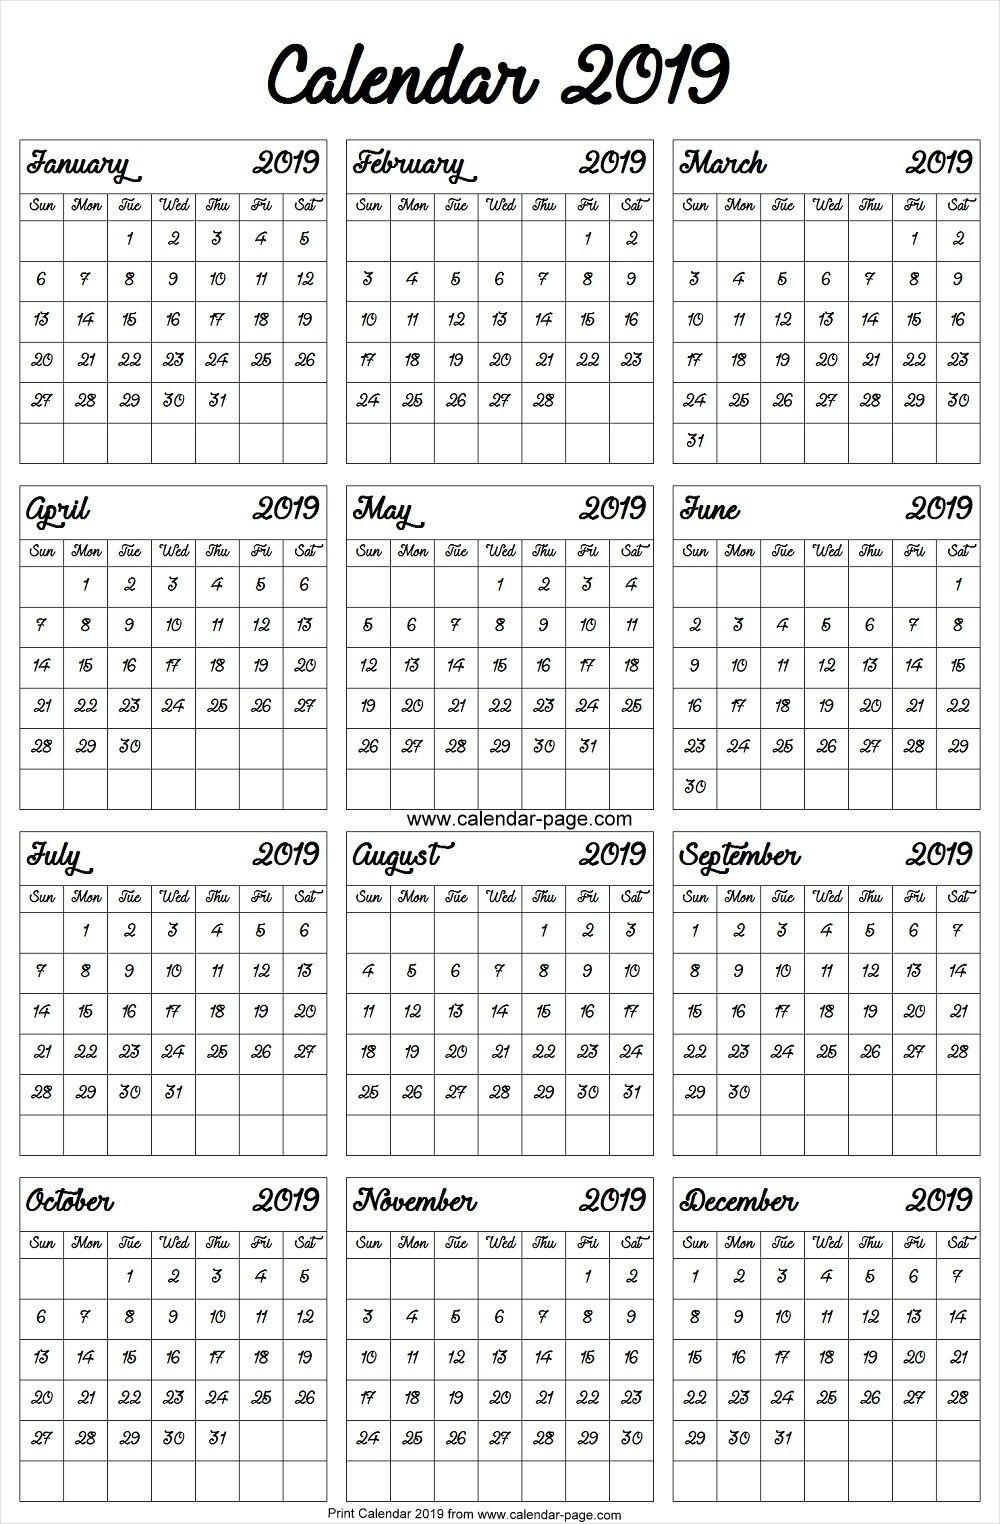 A4 2019 Year Calendar | 2019 Calendar Template | Blank Calendar for A4 Yearly Calendars For 2019 And 2020